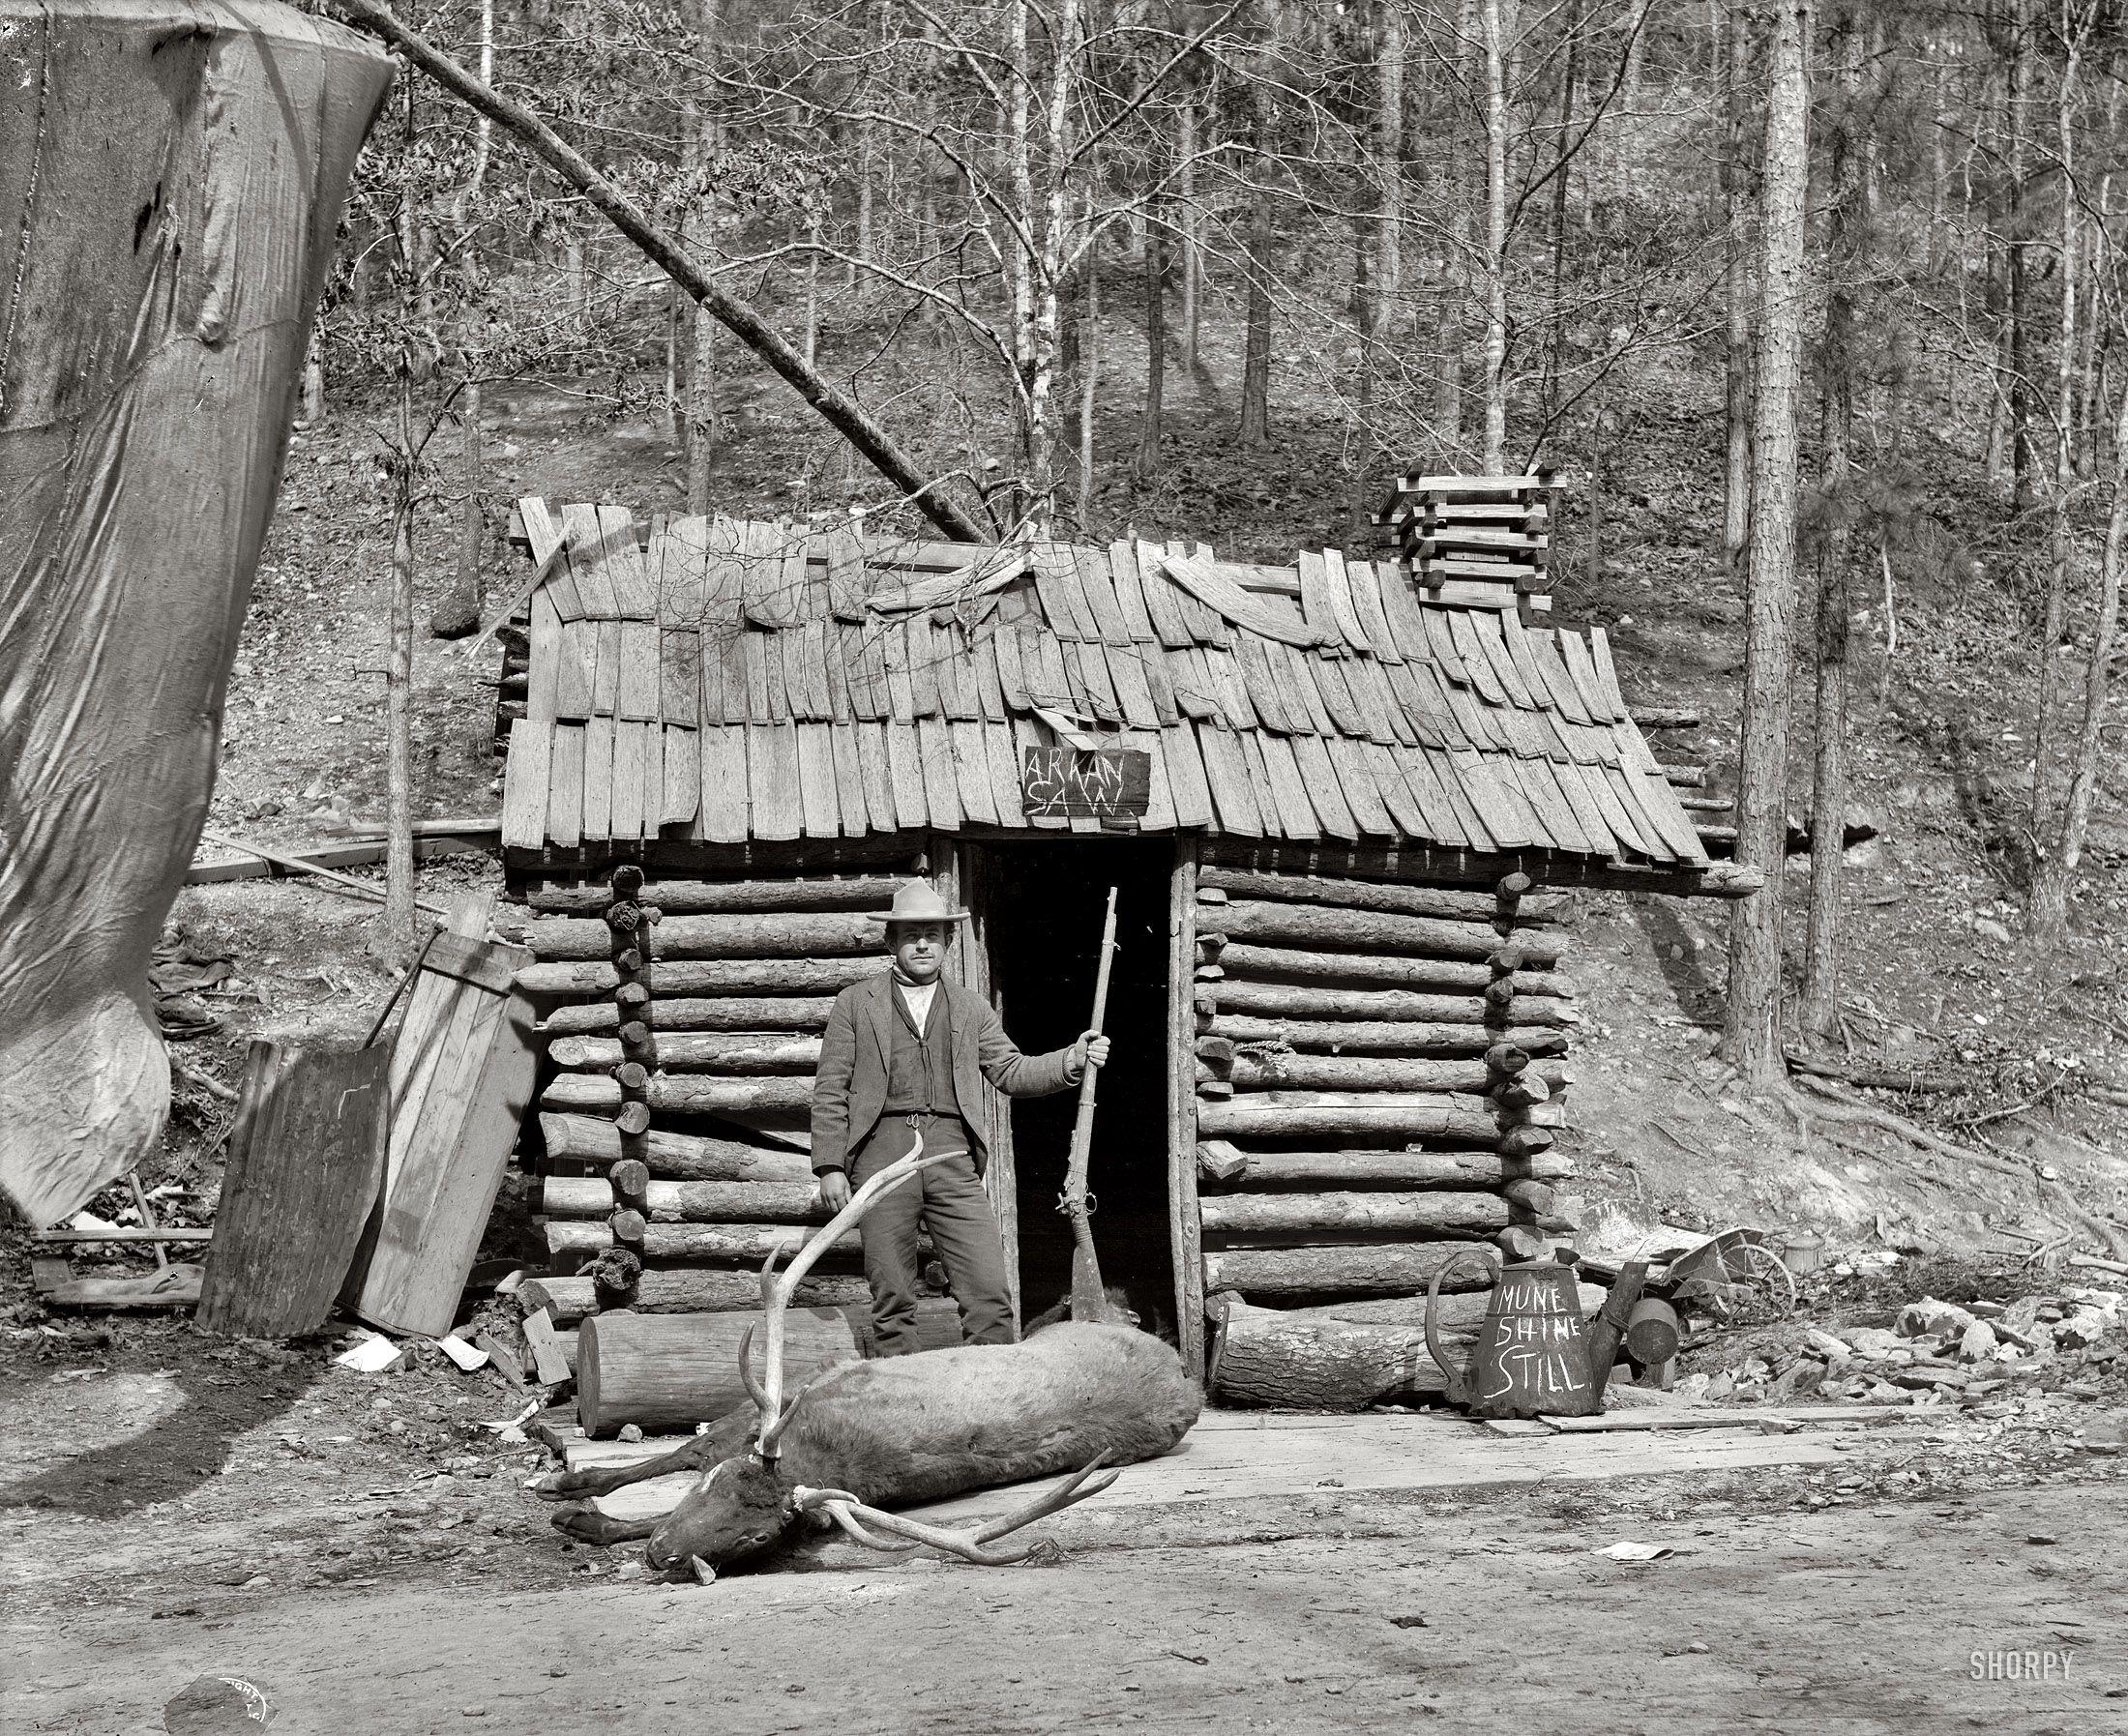 breakfast nice springs in spring cabin knotty zpskdjoomns cabins arkansas and rustic hot bed